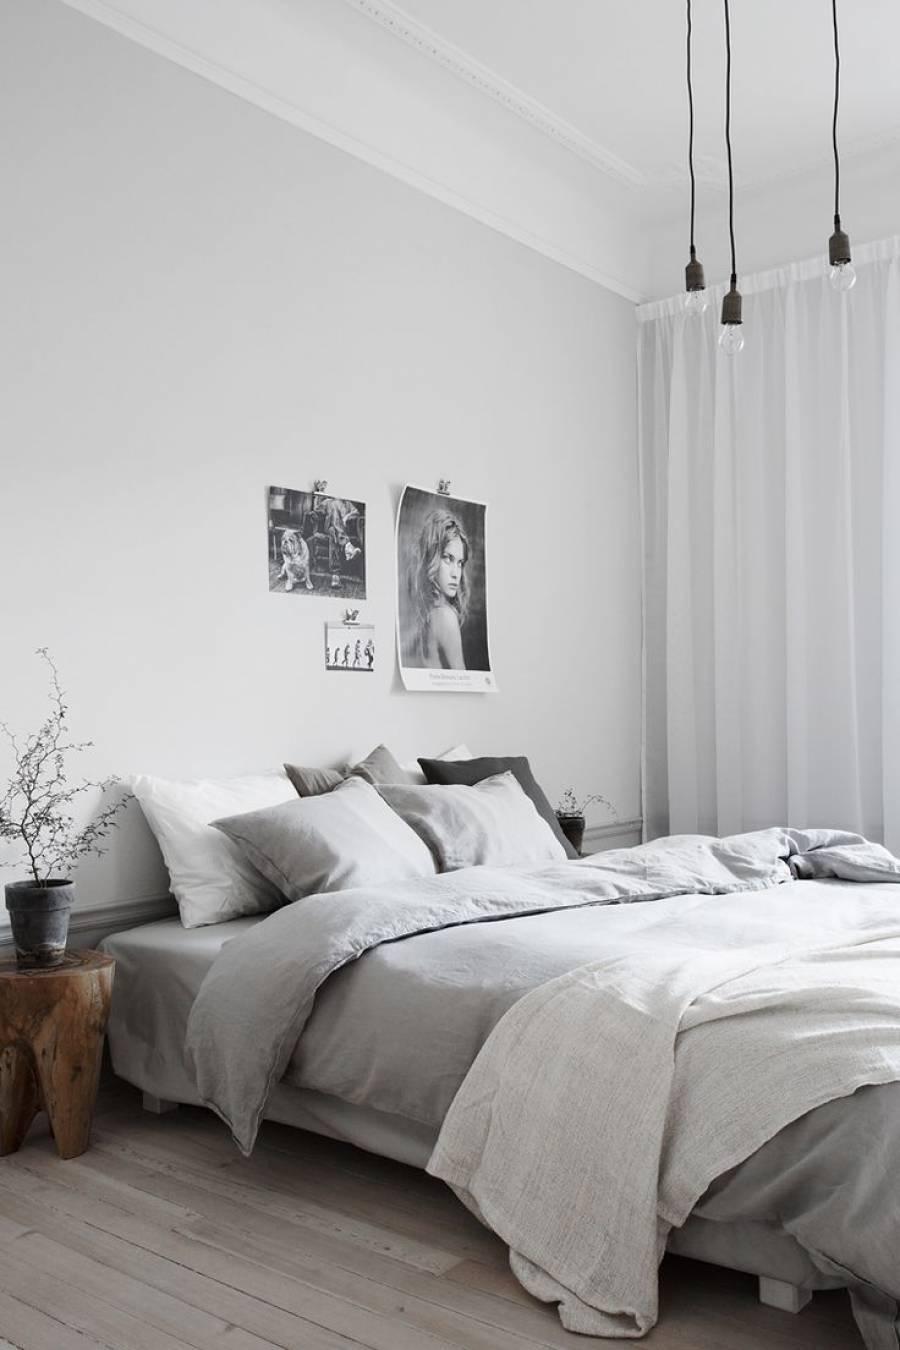 slaapkamer idee235n grijs thomas gaspersz